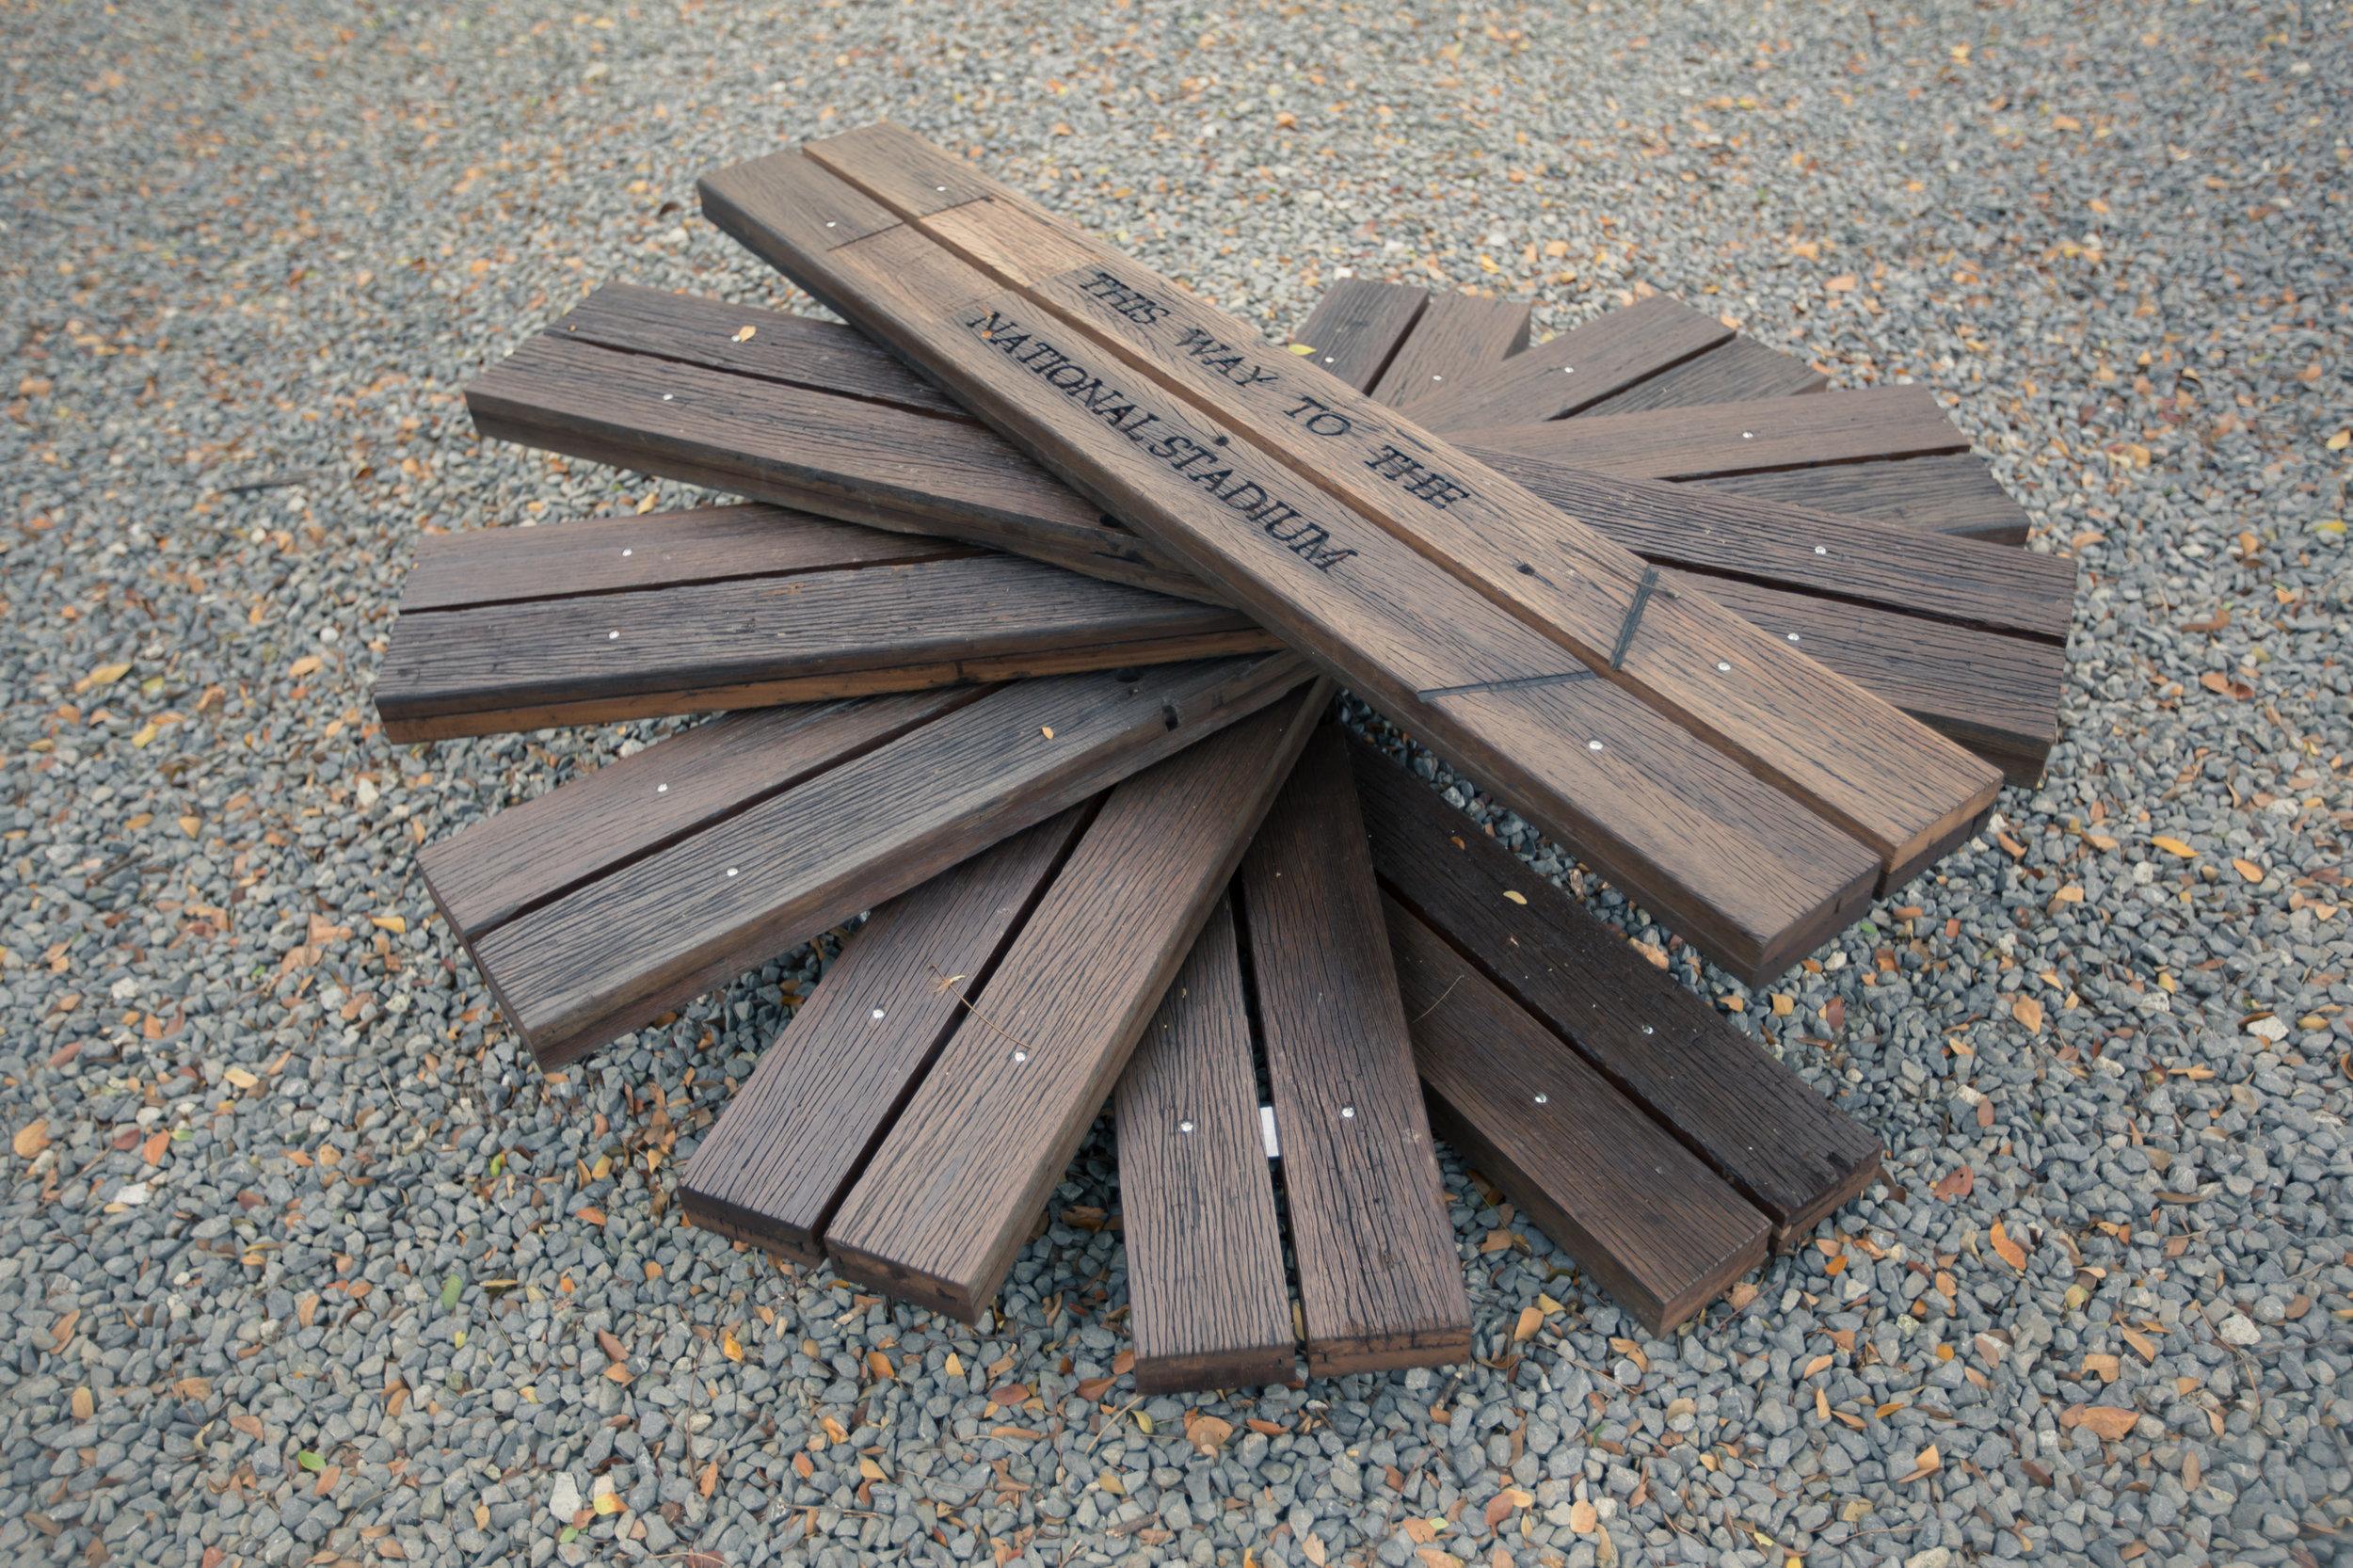 Benches & Sculptures - Design elements & public art installations